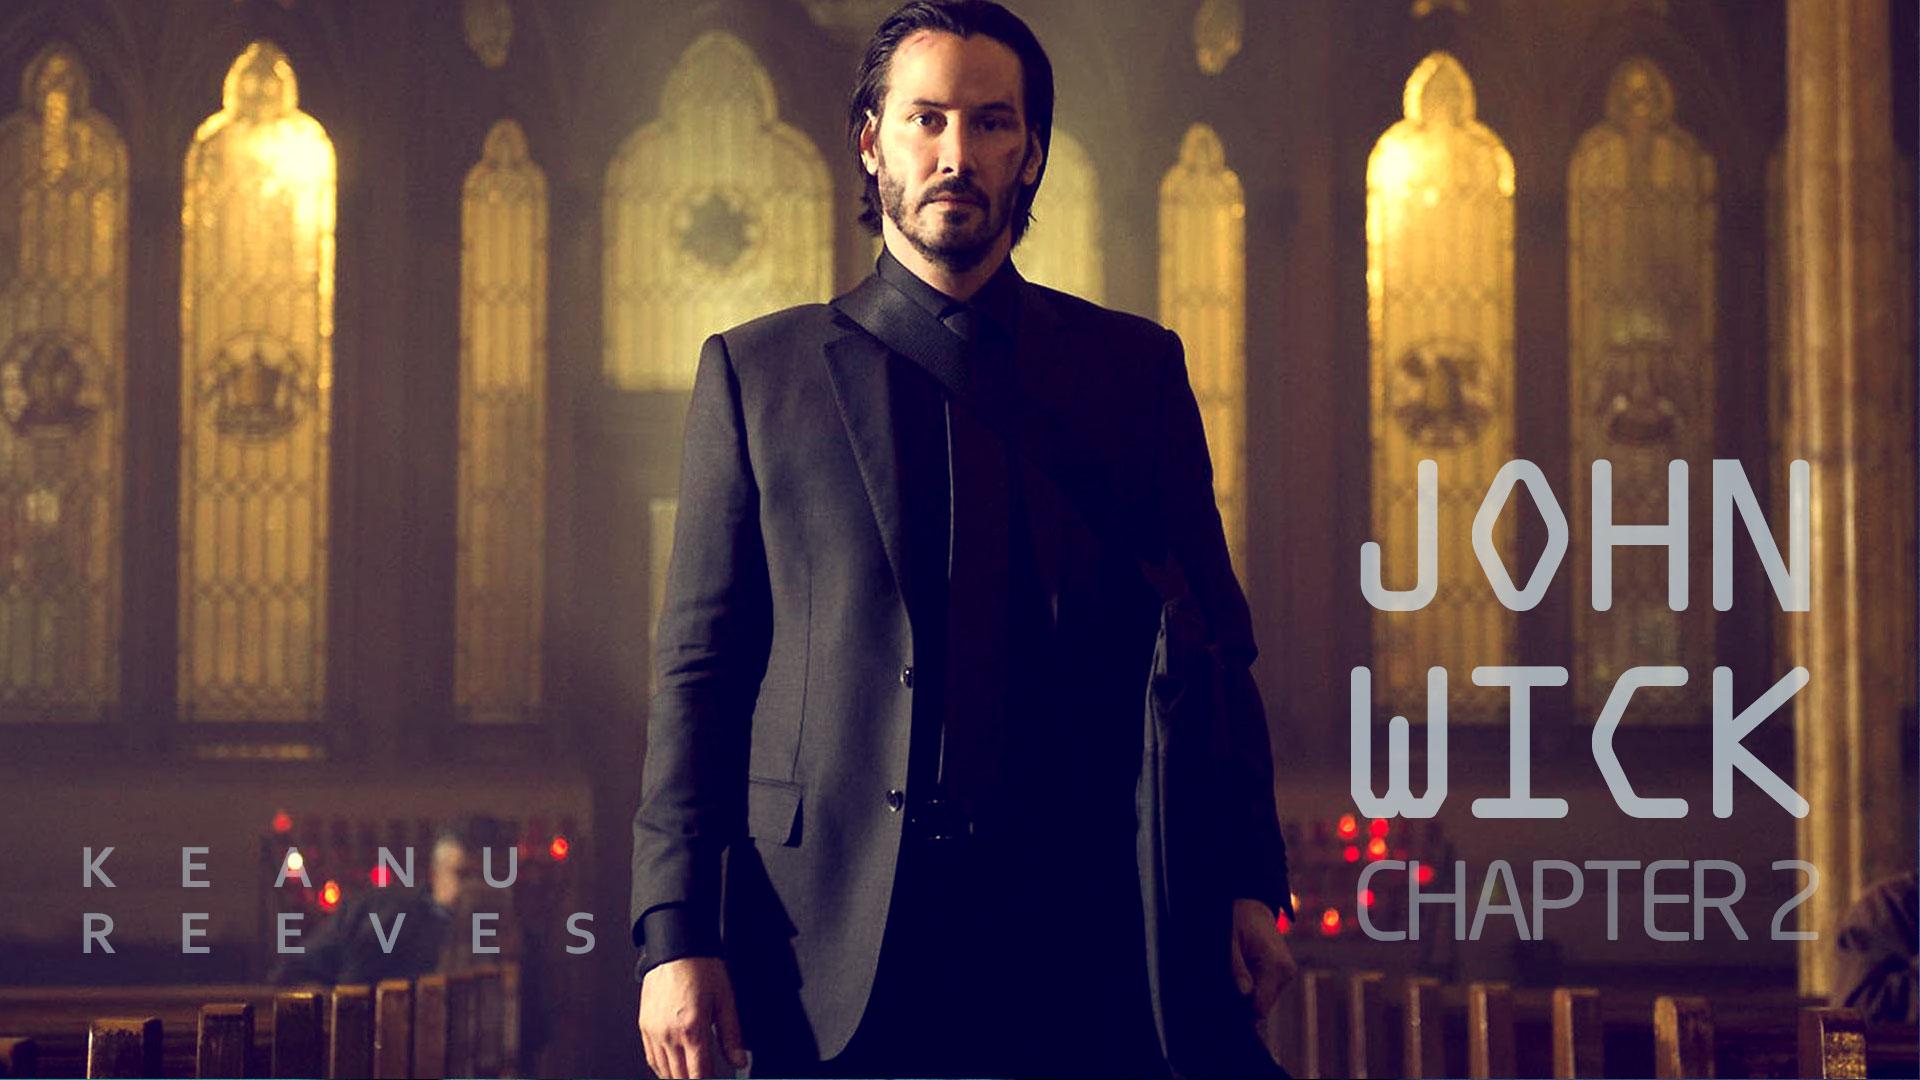 Chapter 2 Wallpaper John Wick Chapter 2 Suit 410115 Hd